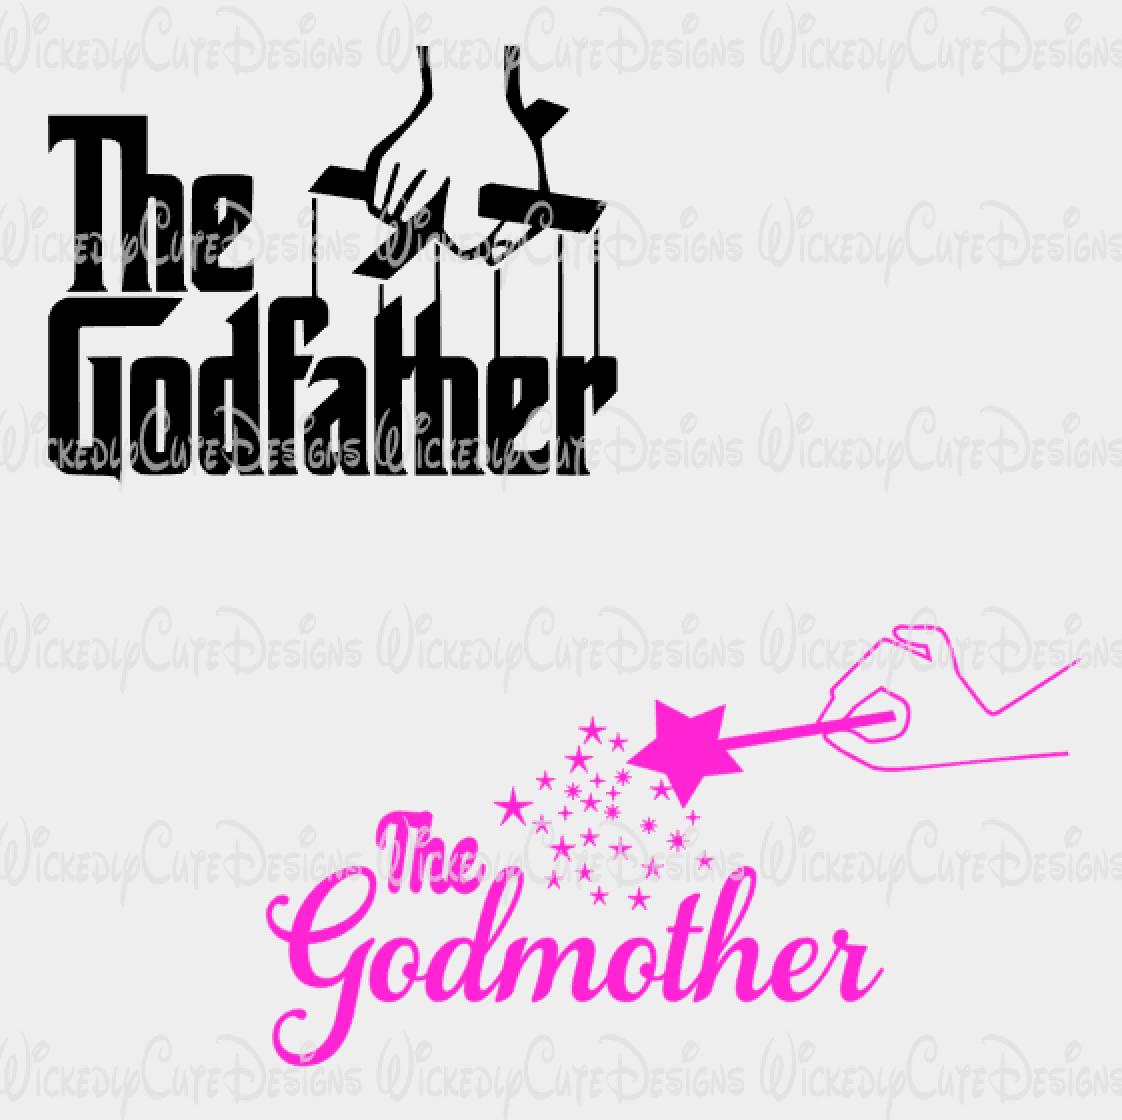 Godmother And Godfather Svg Dxf Eps Png Digital File The